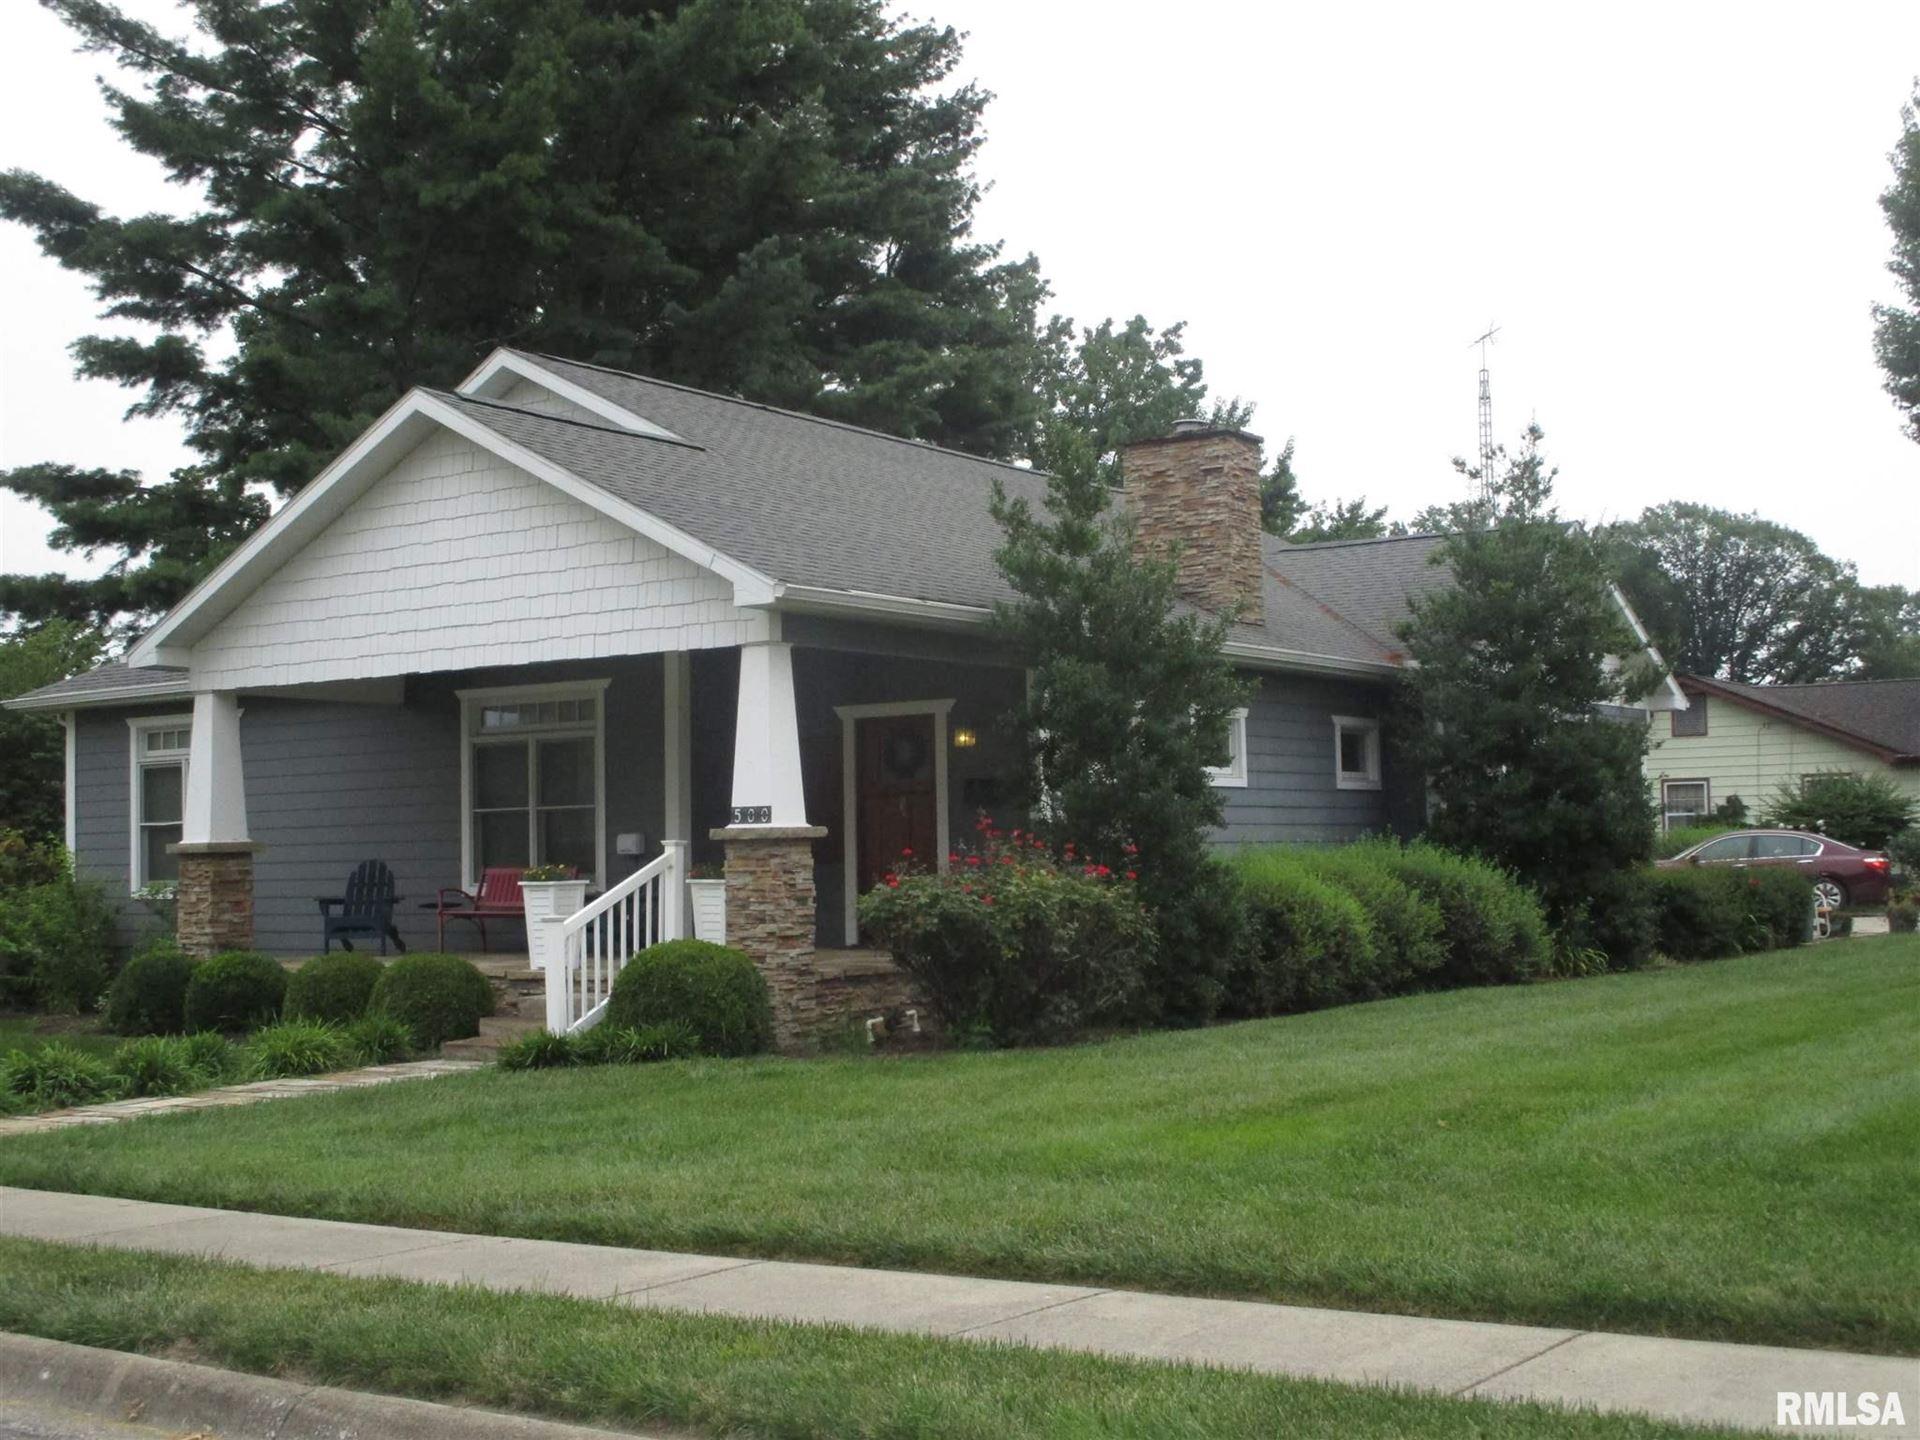 500 N MAPLE, Benton, IL 62812-0000 - MLS#: EB440618